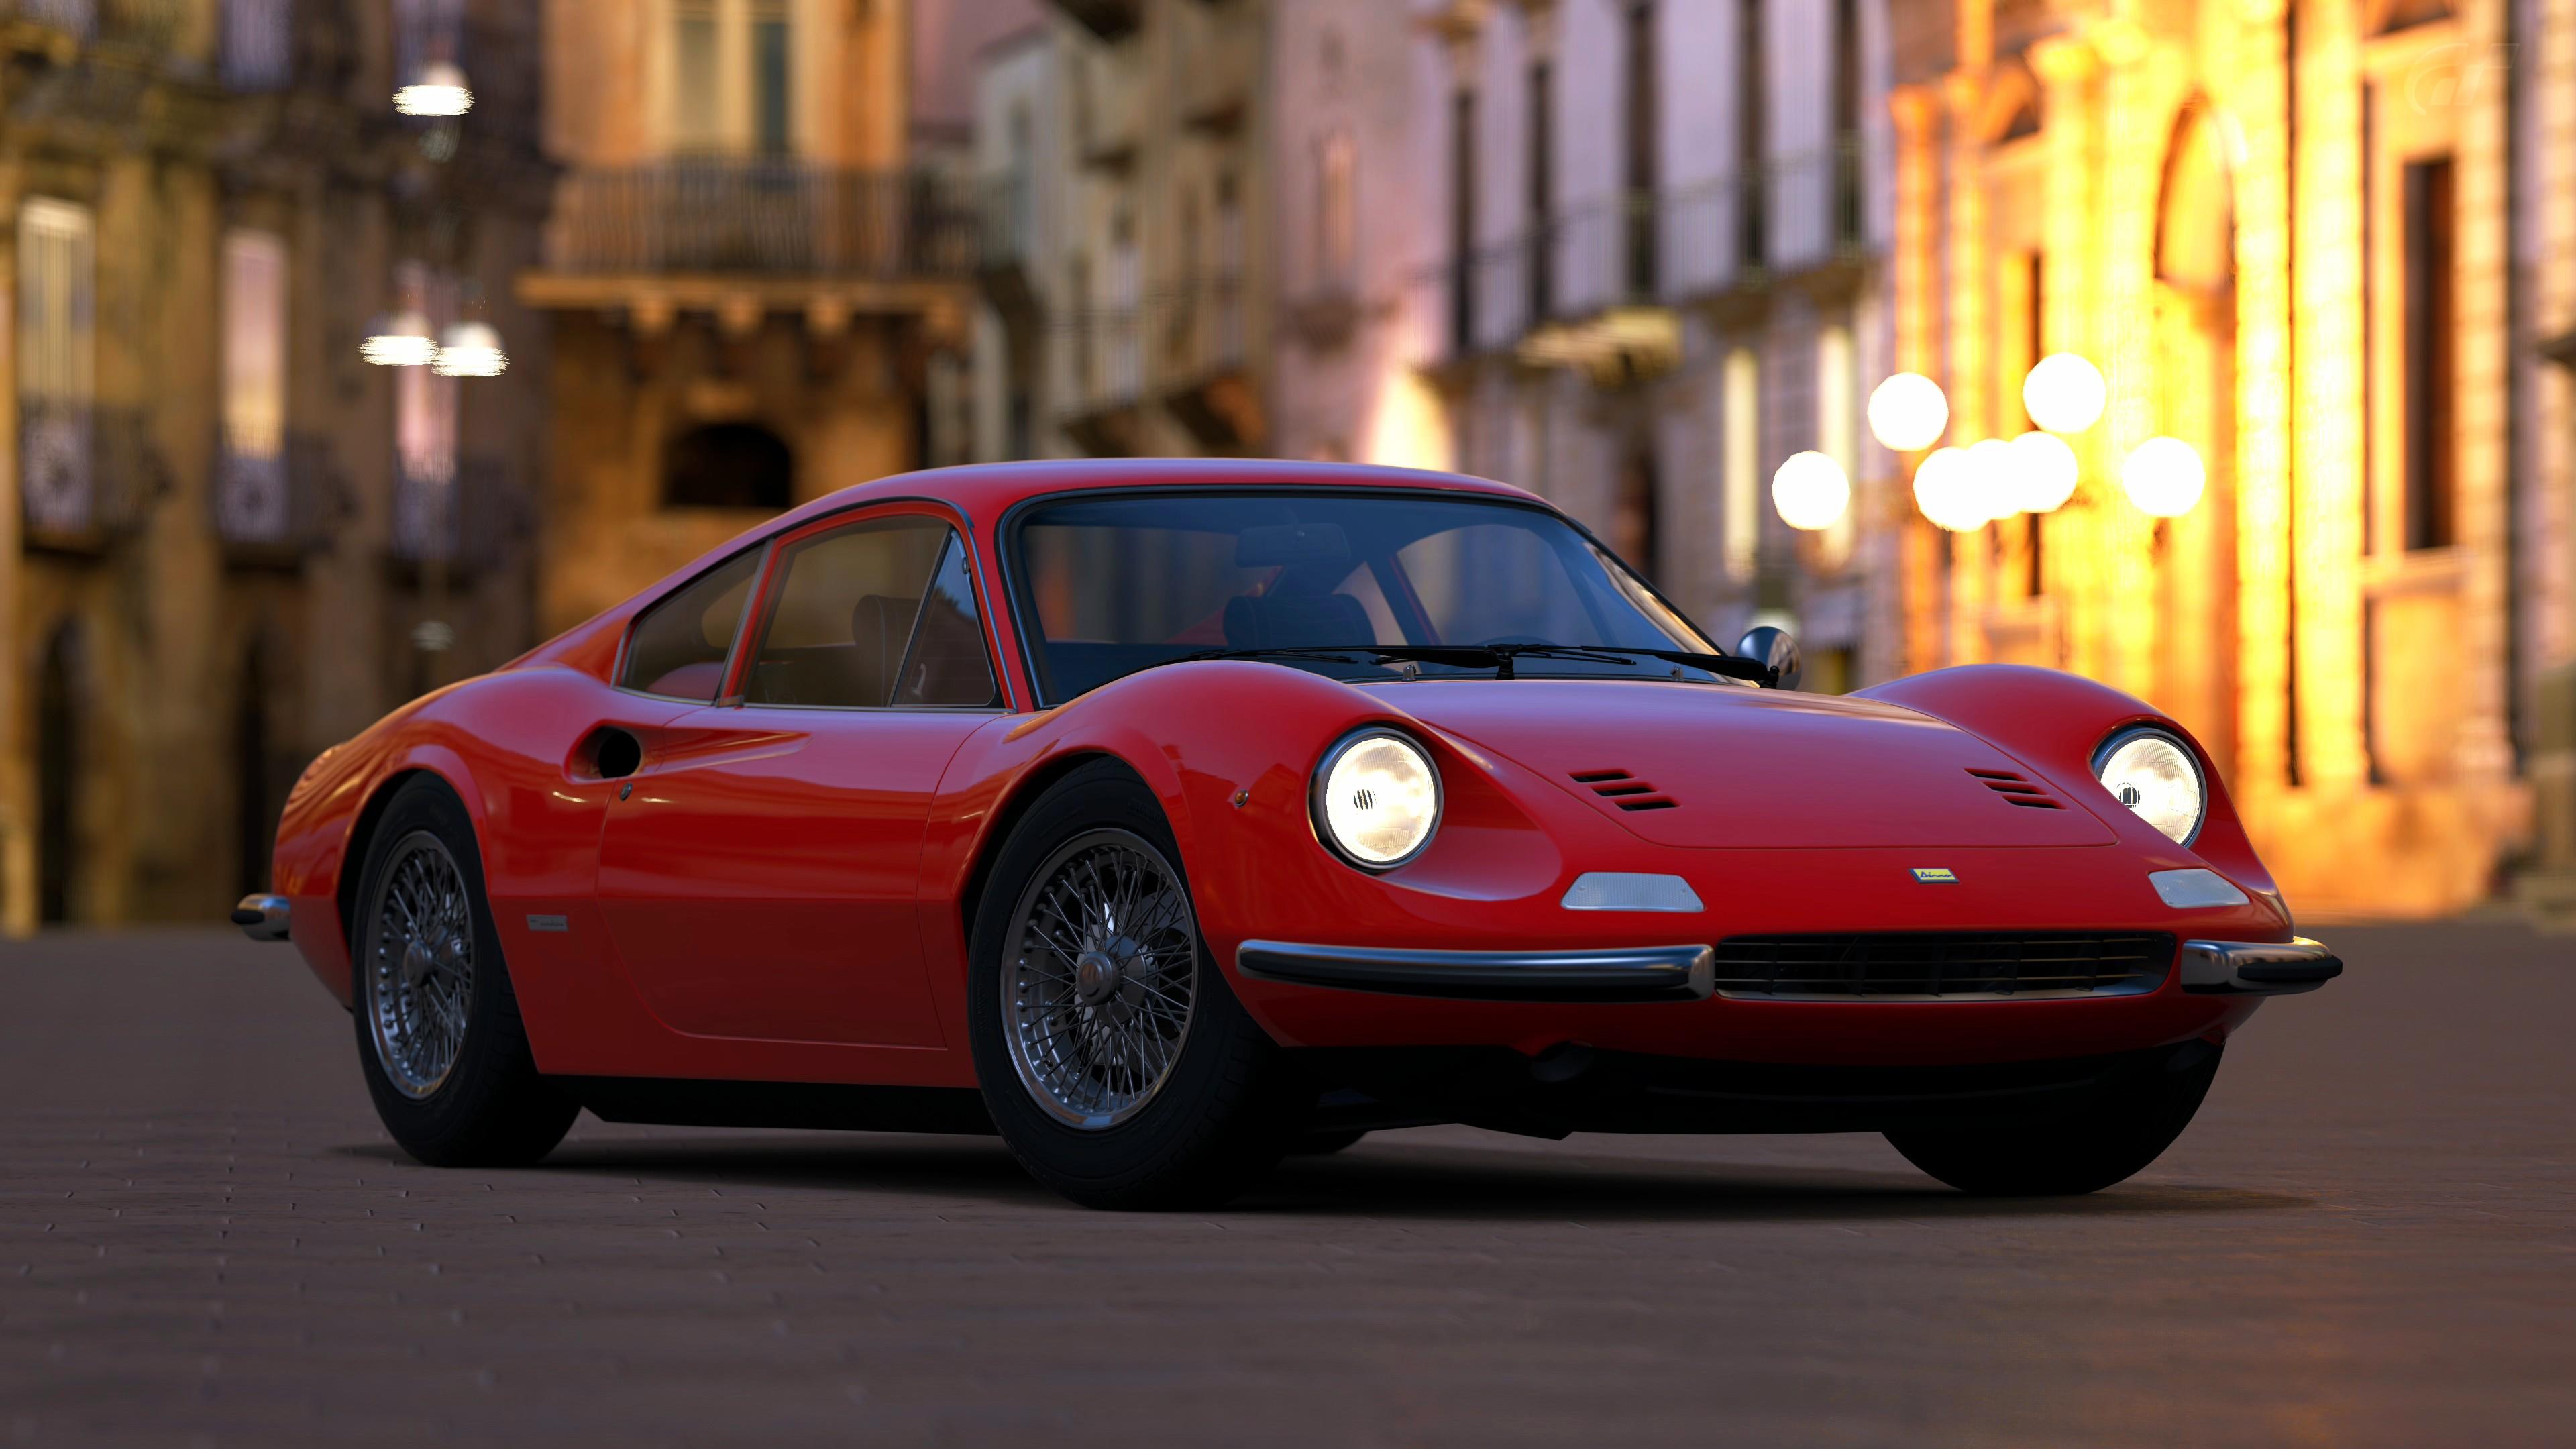 Image Result For Mac Wallpaper Ferrari  Gtb